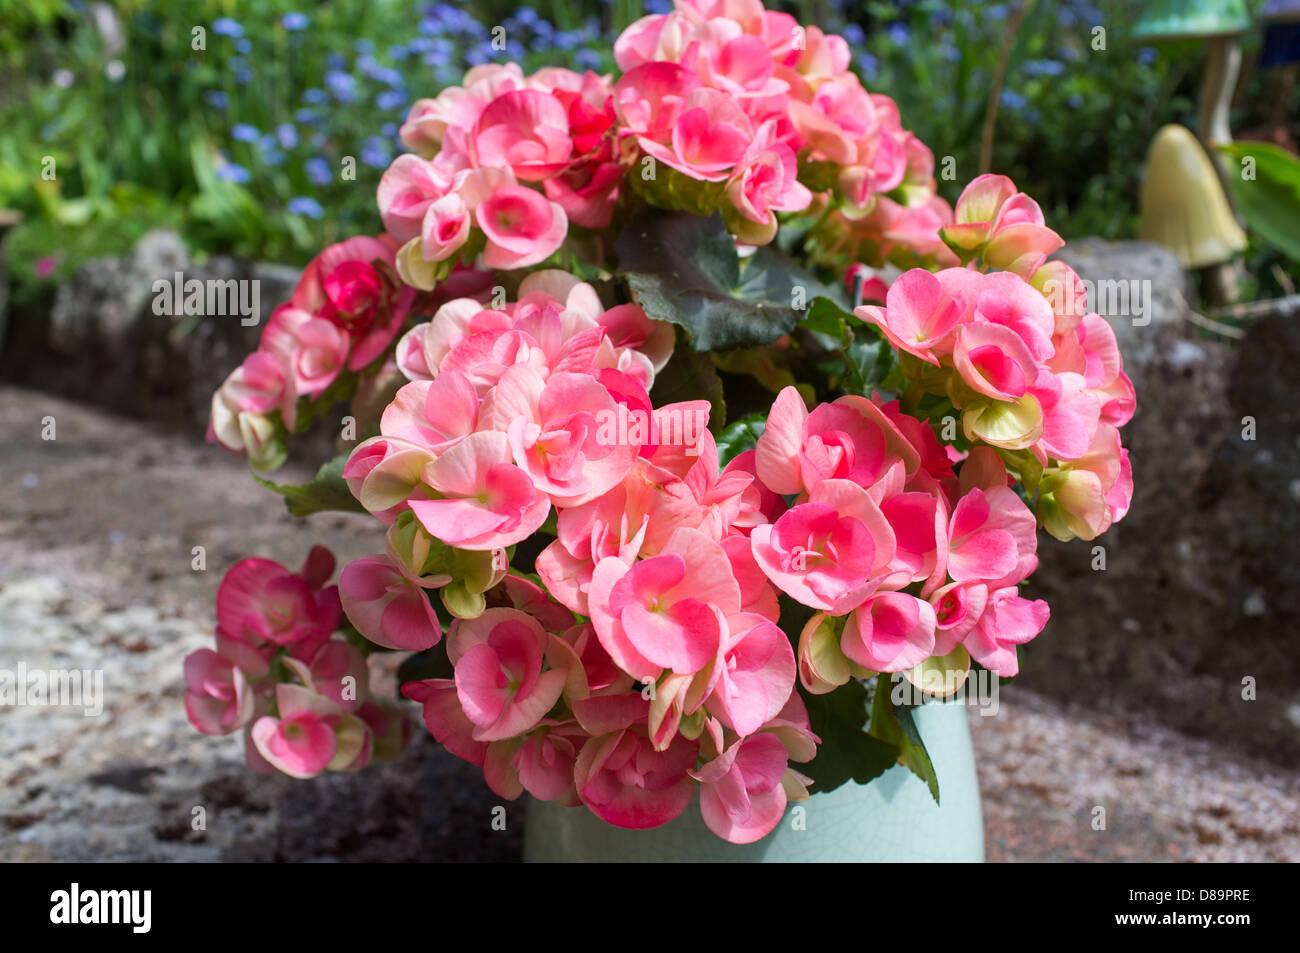 Begonia Is A Genus Of Perennial Flowering Plants The Genus Contains